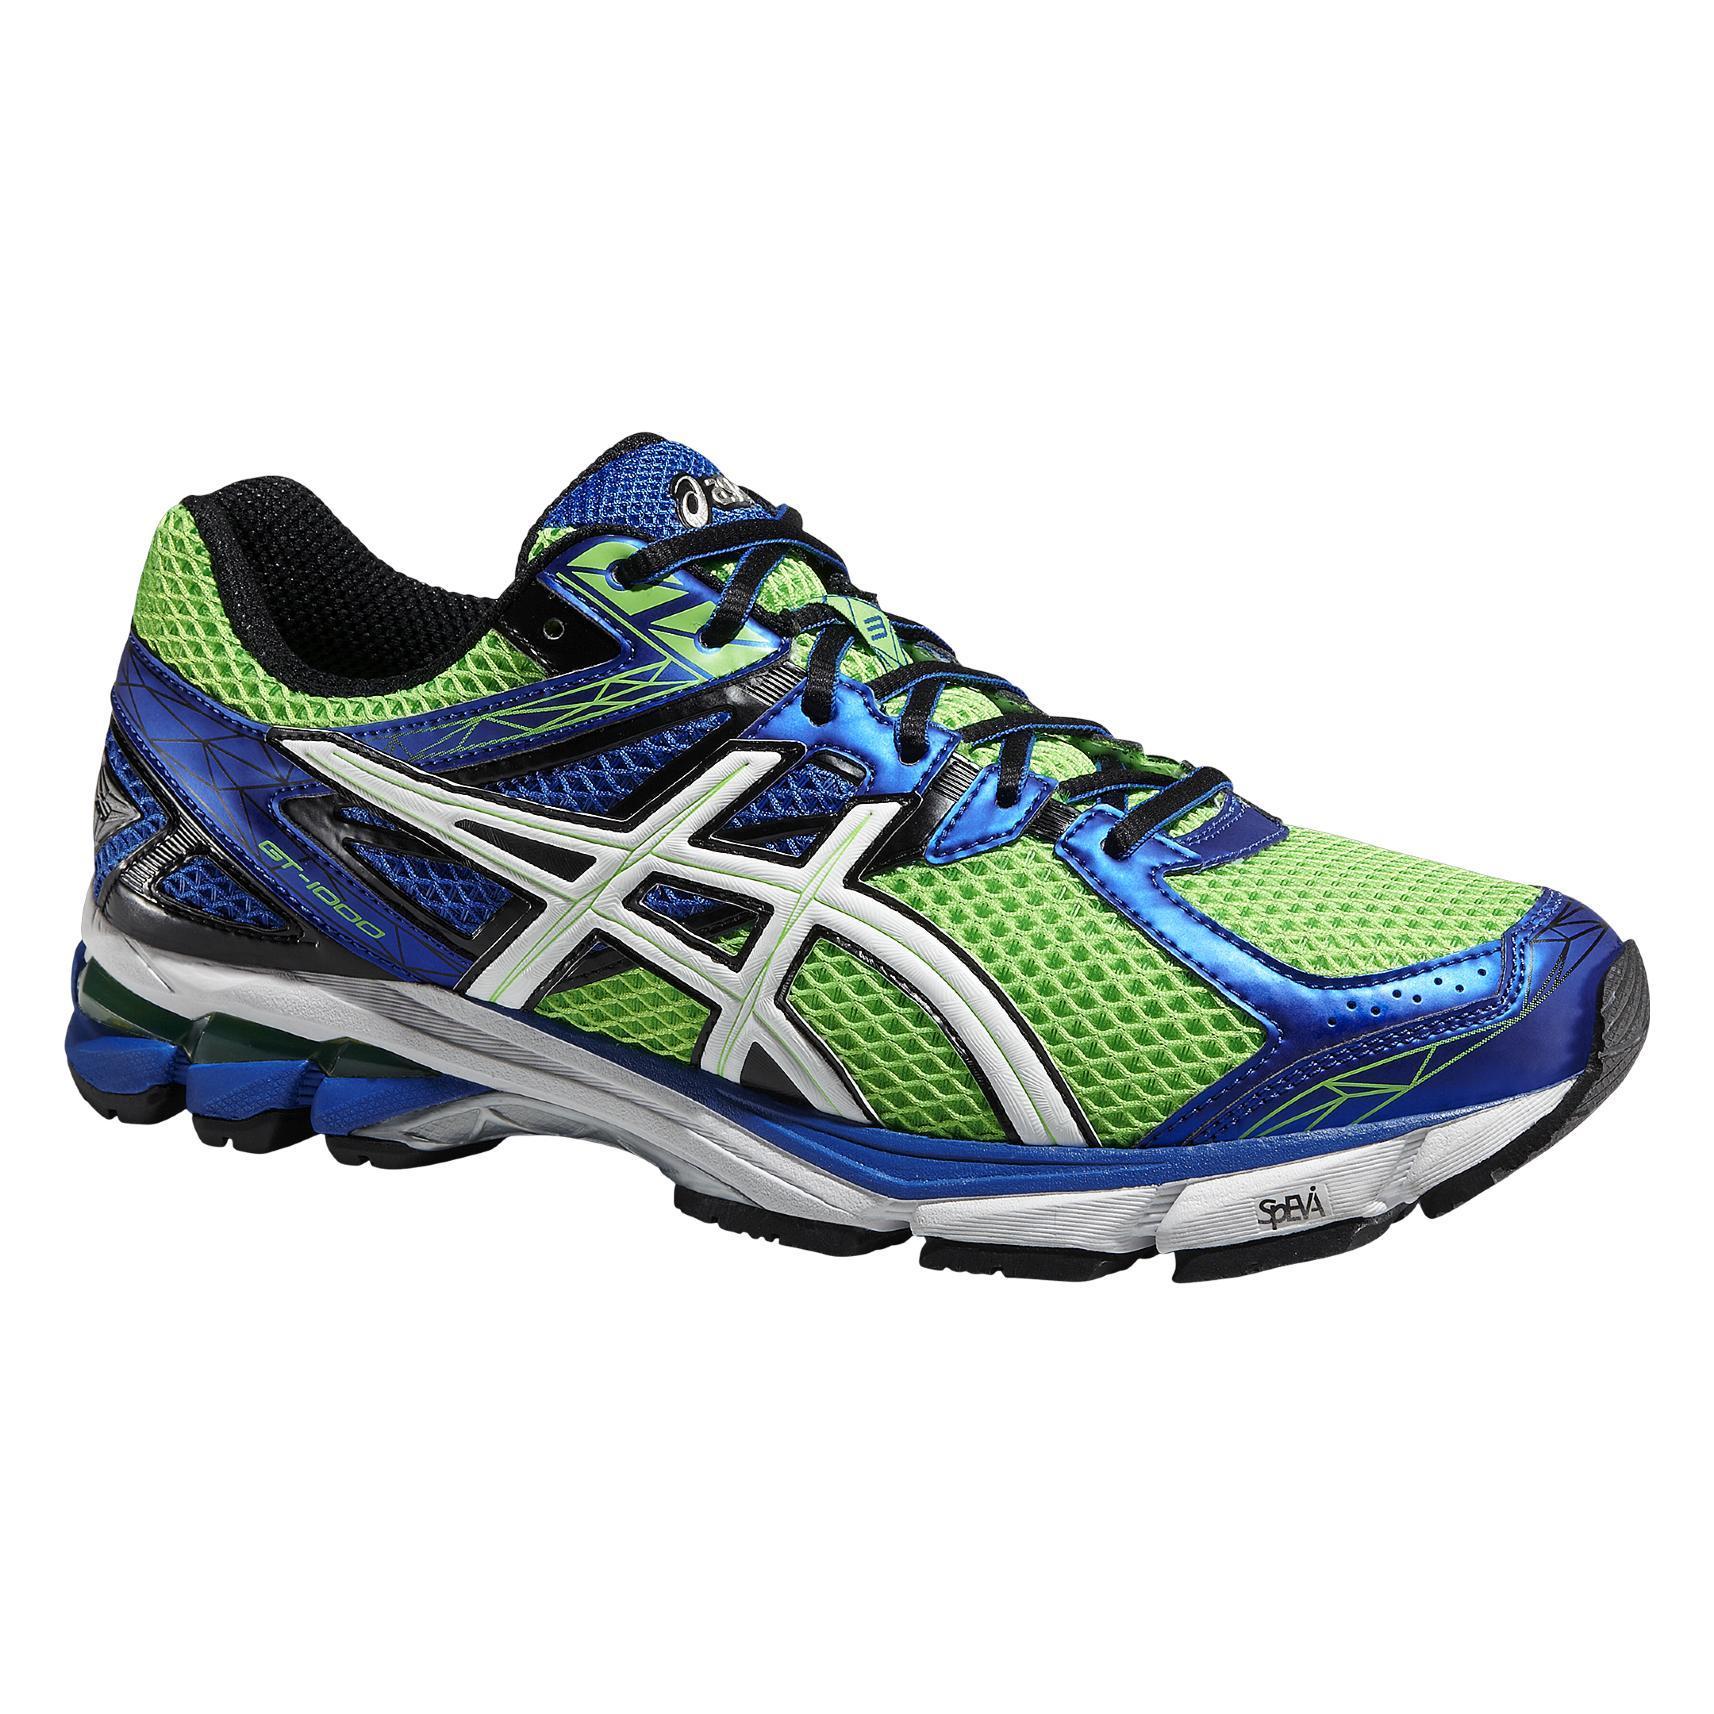 Asics Neon Green Running Shoes